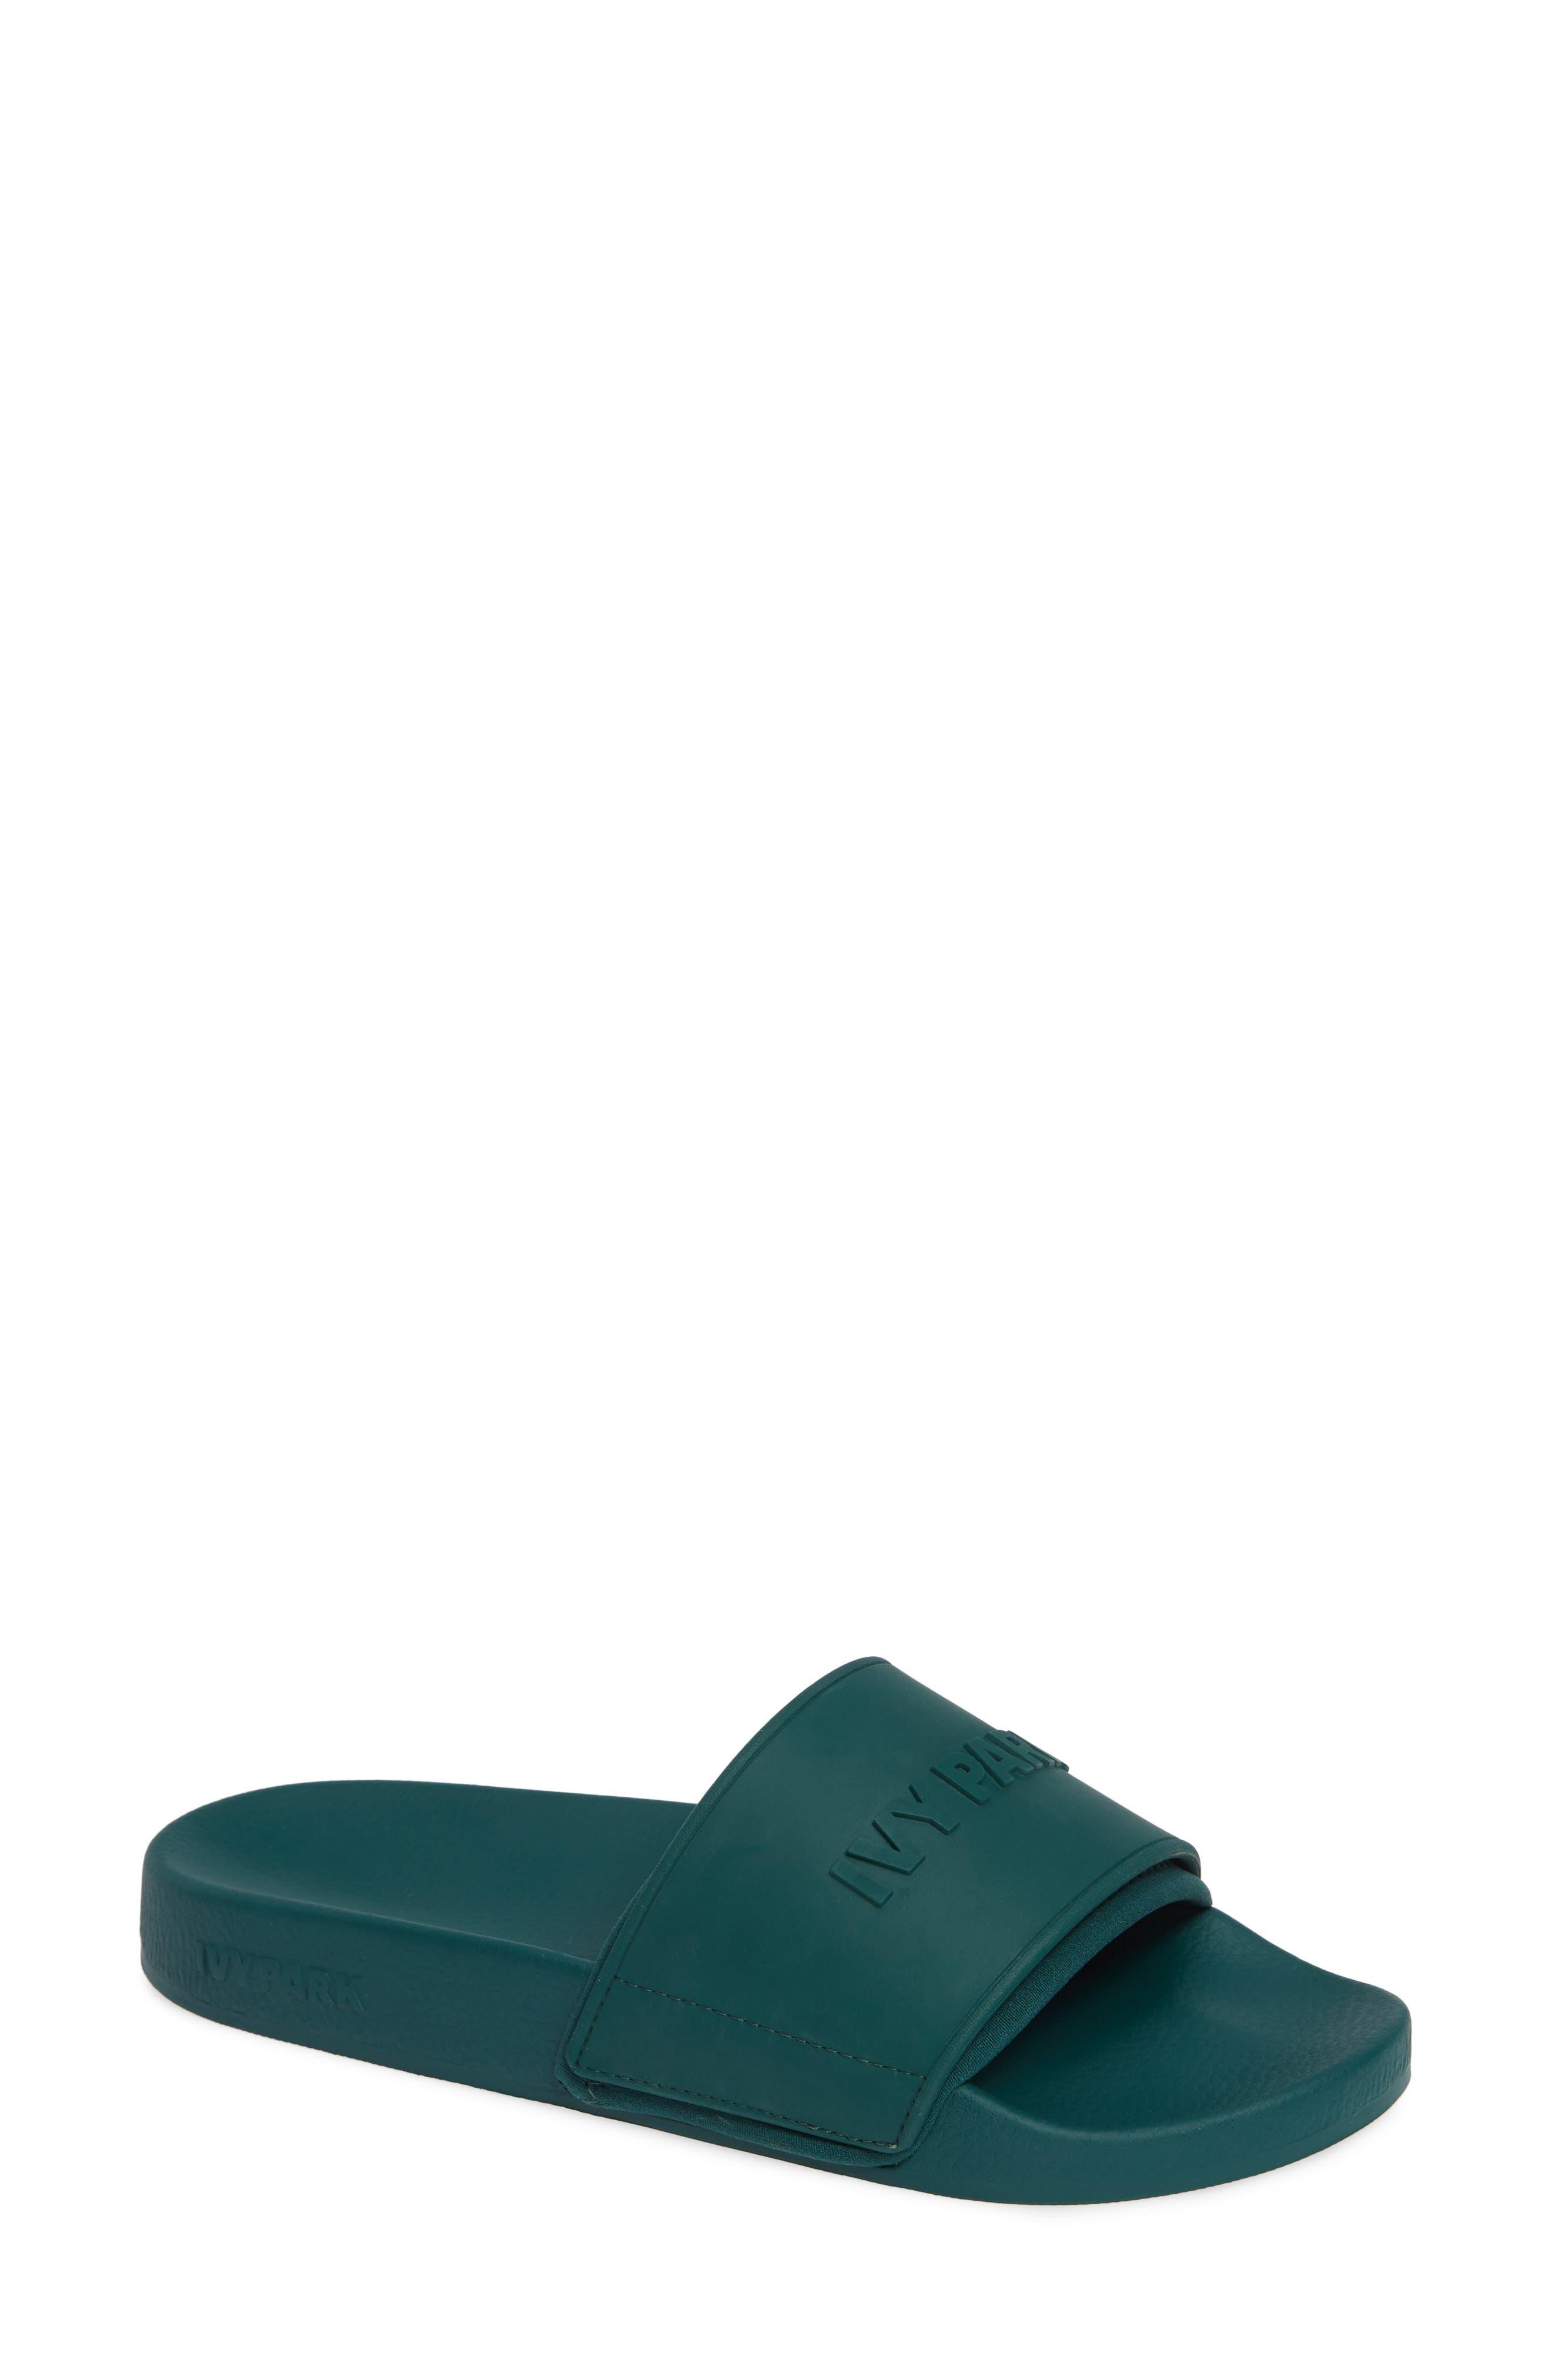 IVY PARK<SUP>®</SUP>, Embossed Logo Slide Sandal, Main thumbnail 1, color, 300